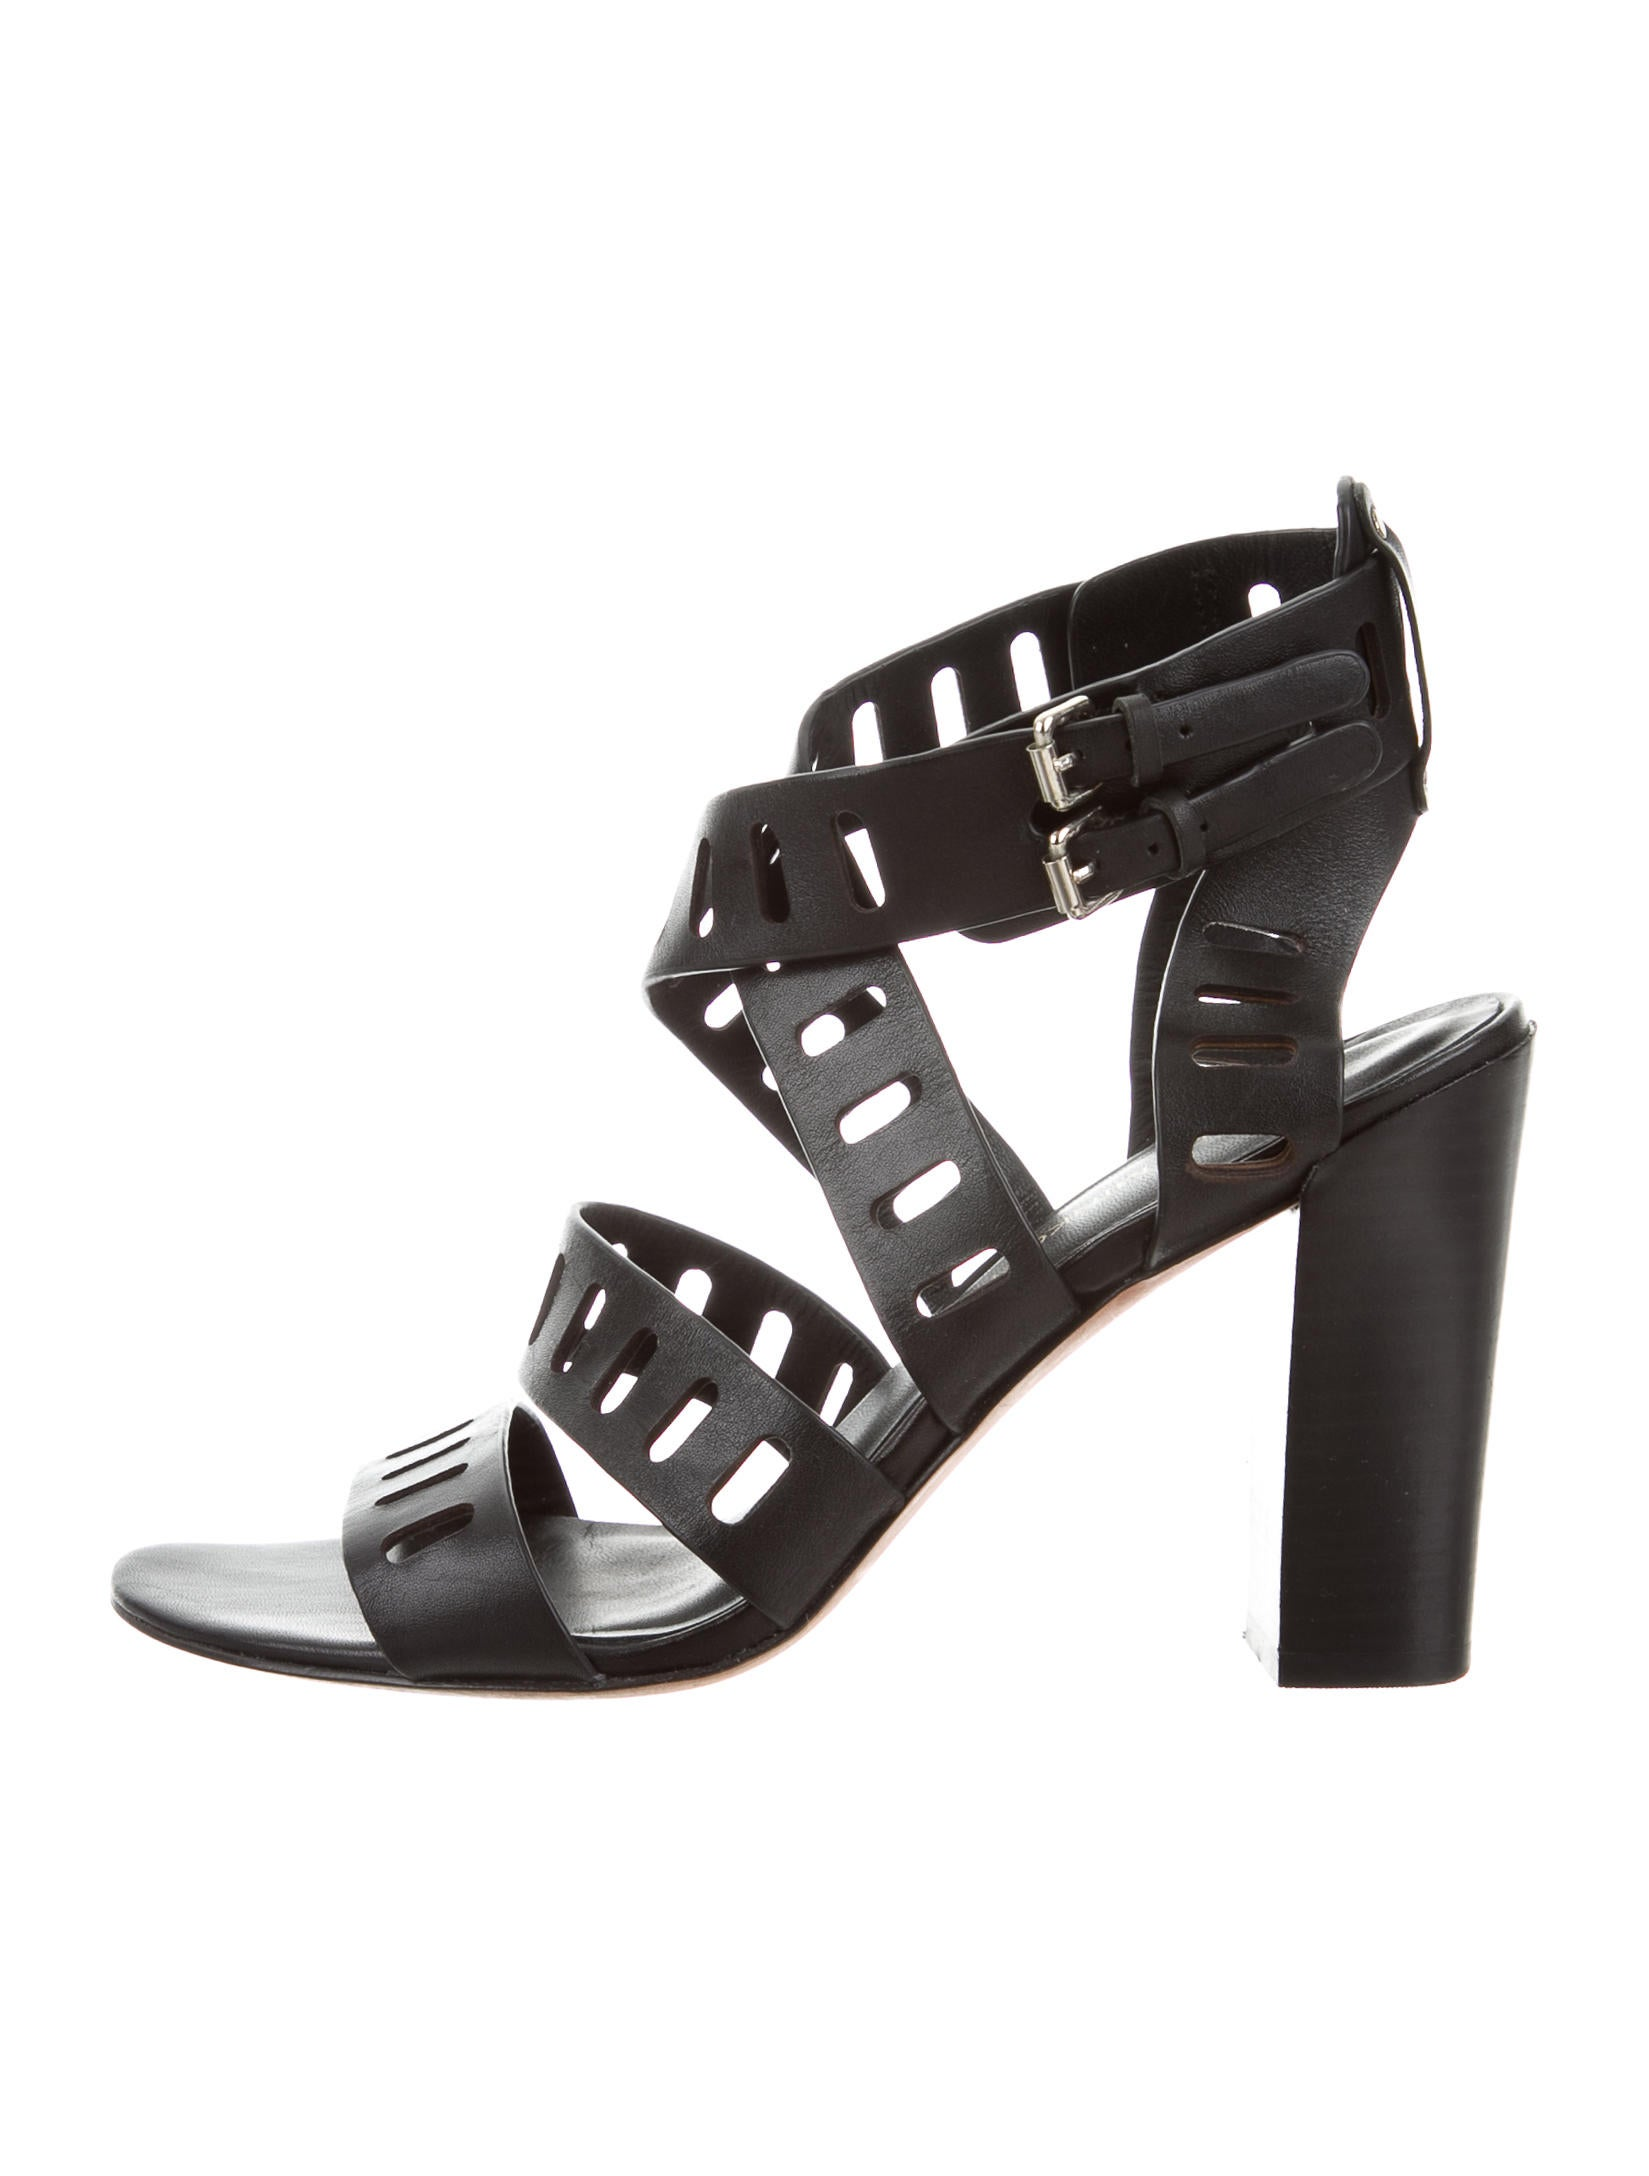 buy cheap fashion Style shop offer cheap price Rebecca Minkoff Multistrap Laser Cut Sandals classic sale online low cost sale online EOTamX